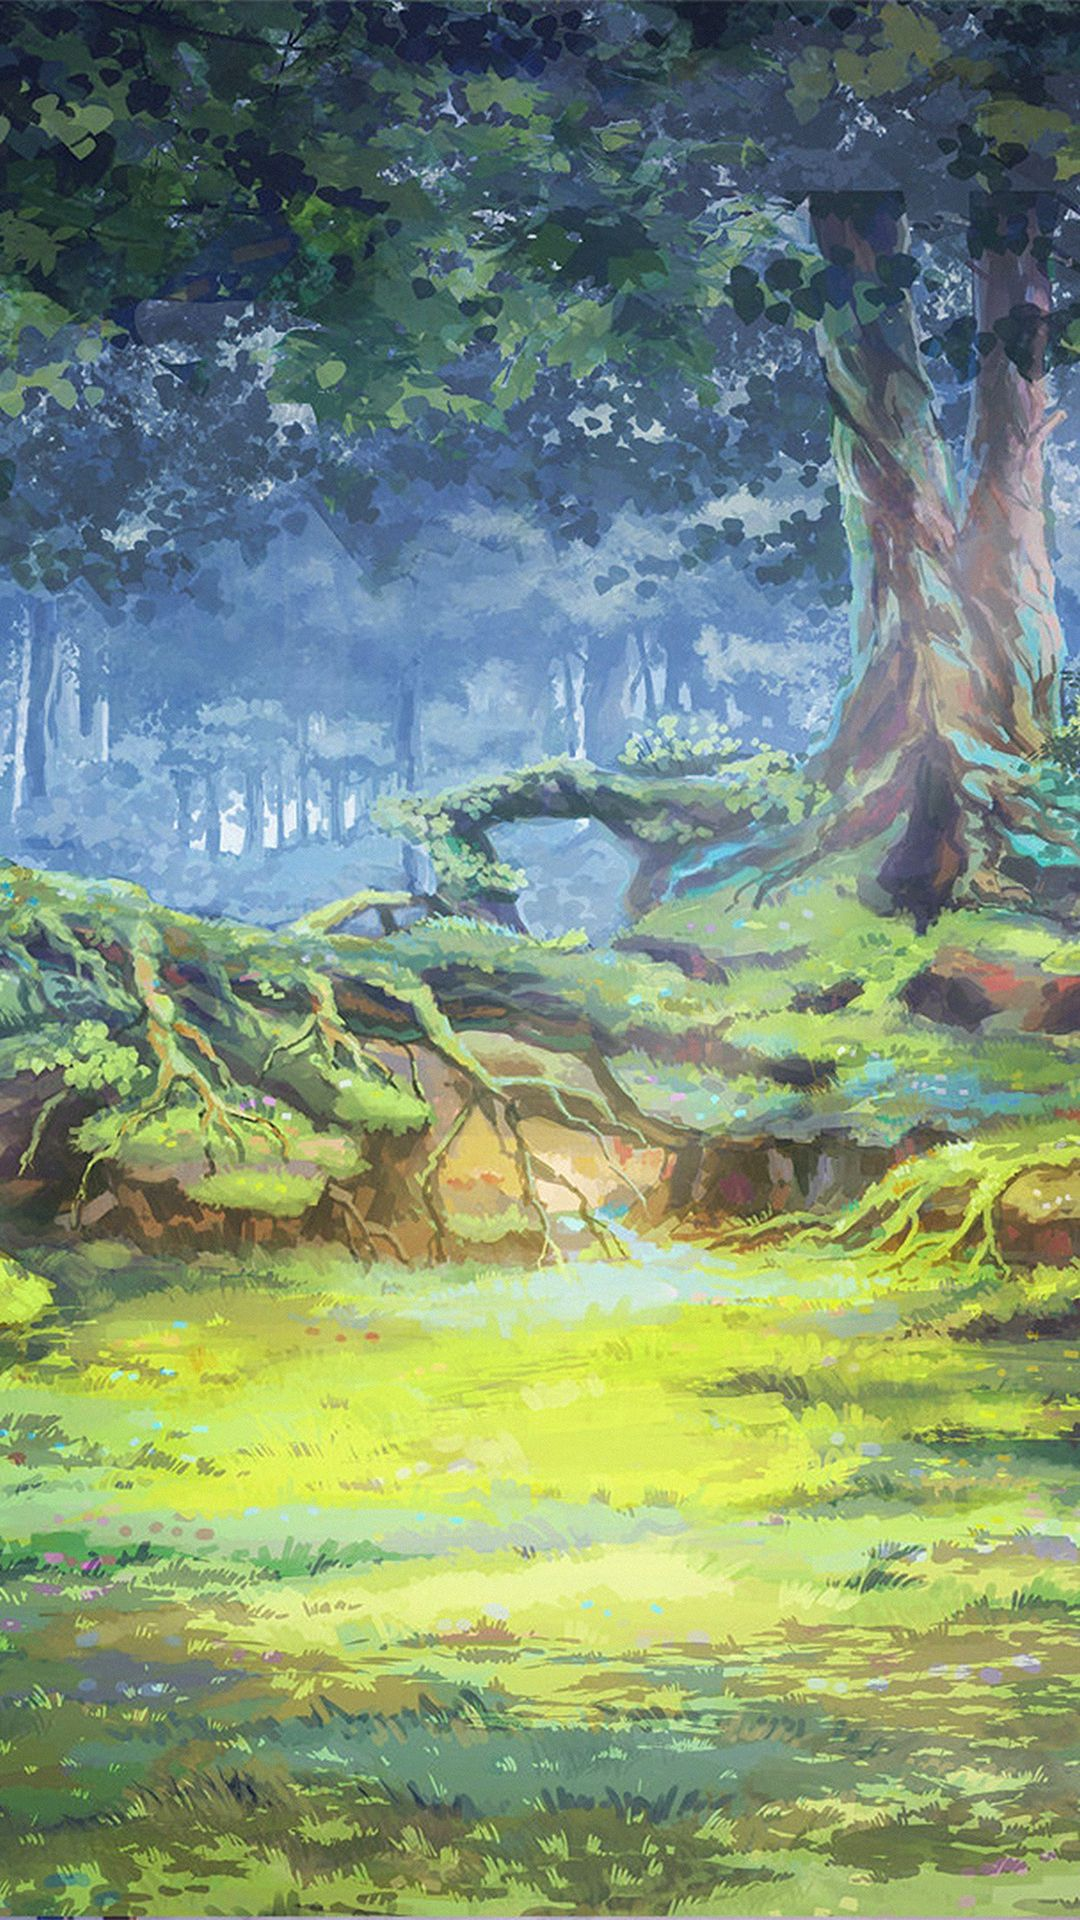 Nature Grove Tree Grassland Illustration Art Iphone 6 Wallpaper Nature Illustration Landscape Art Art Wallpaper Iphone